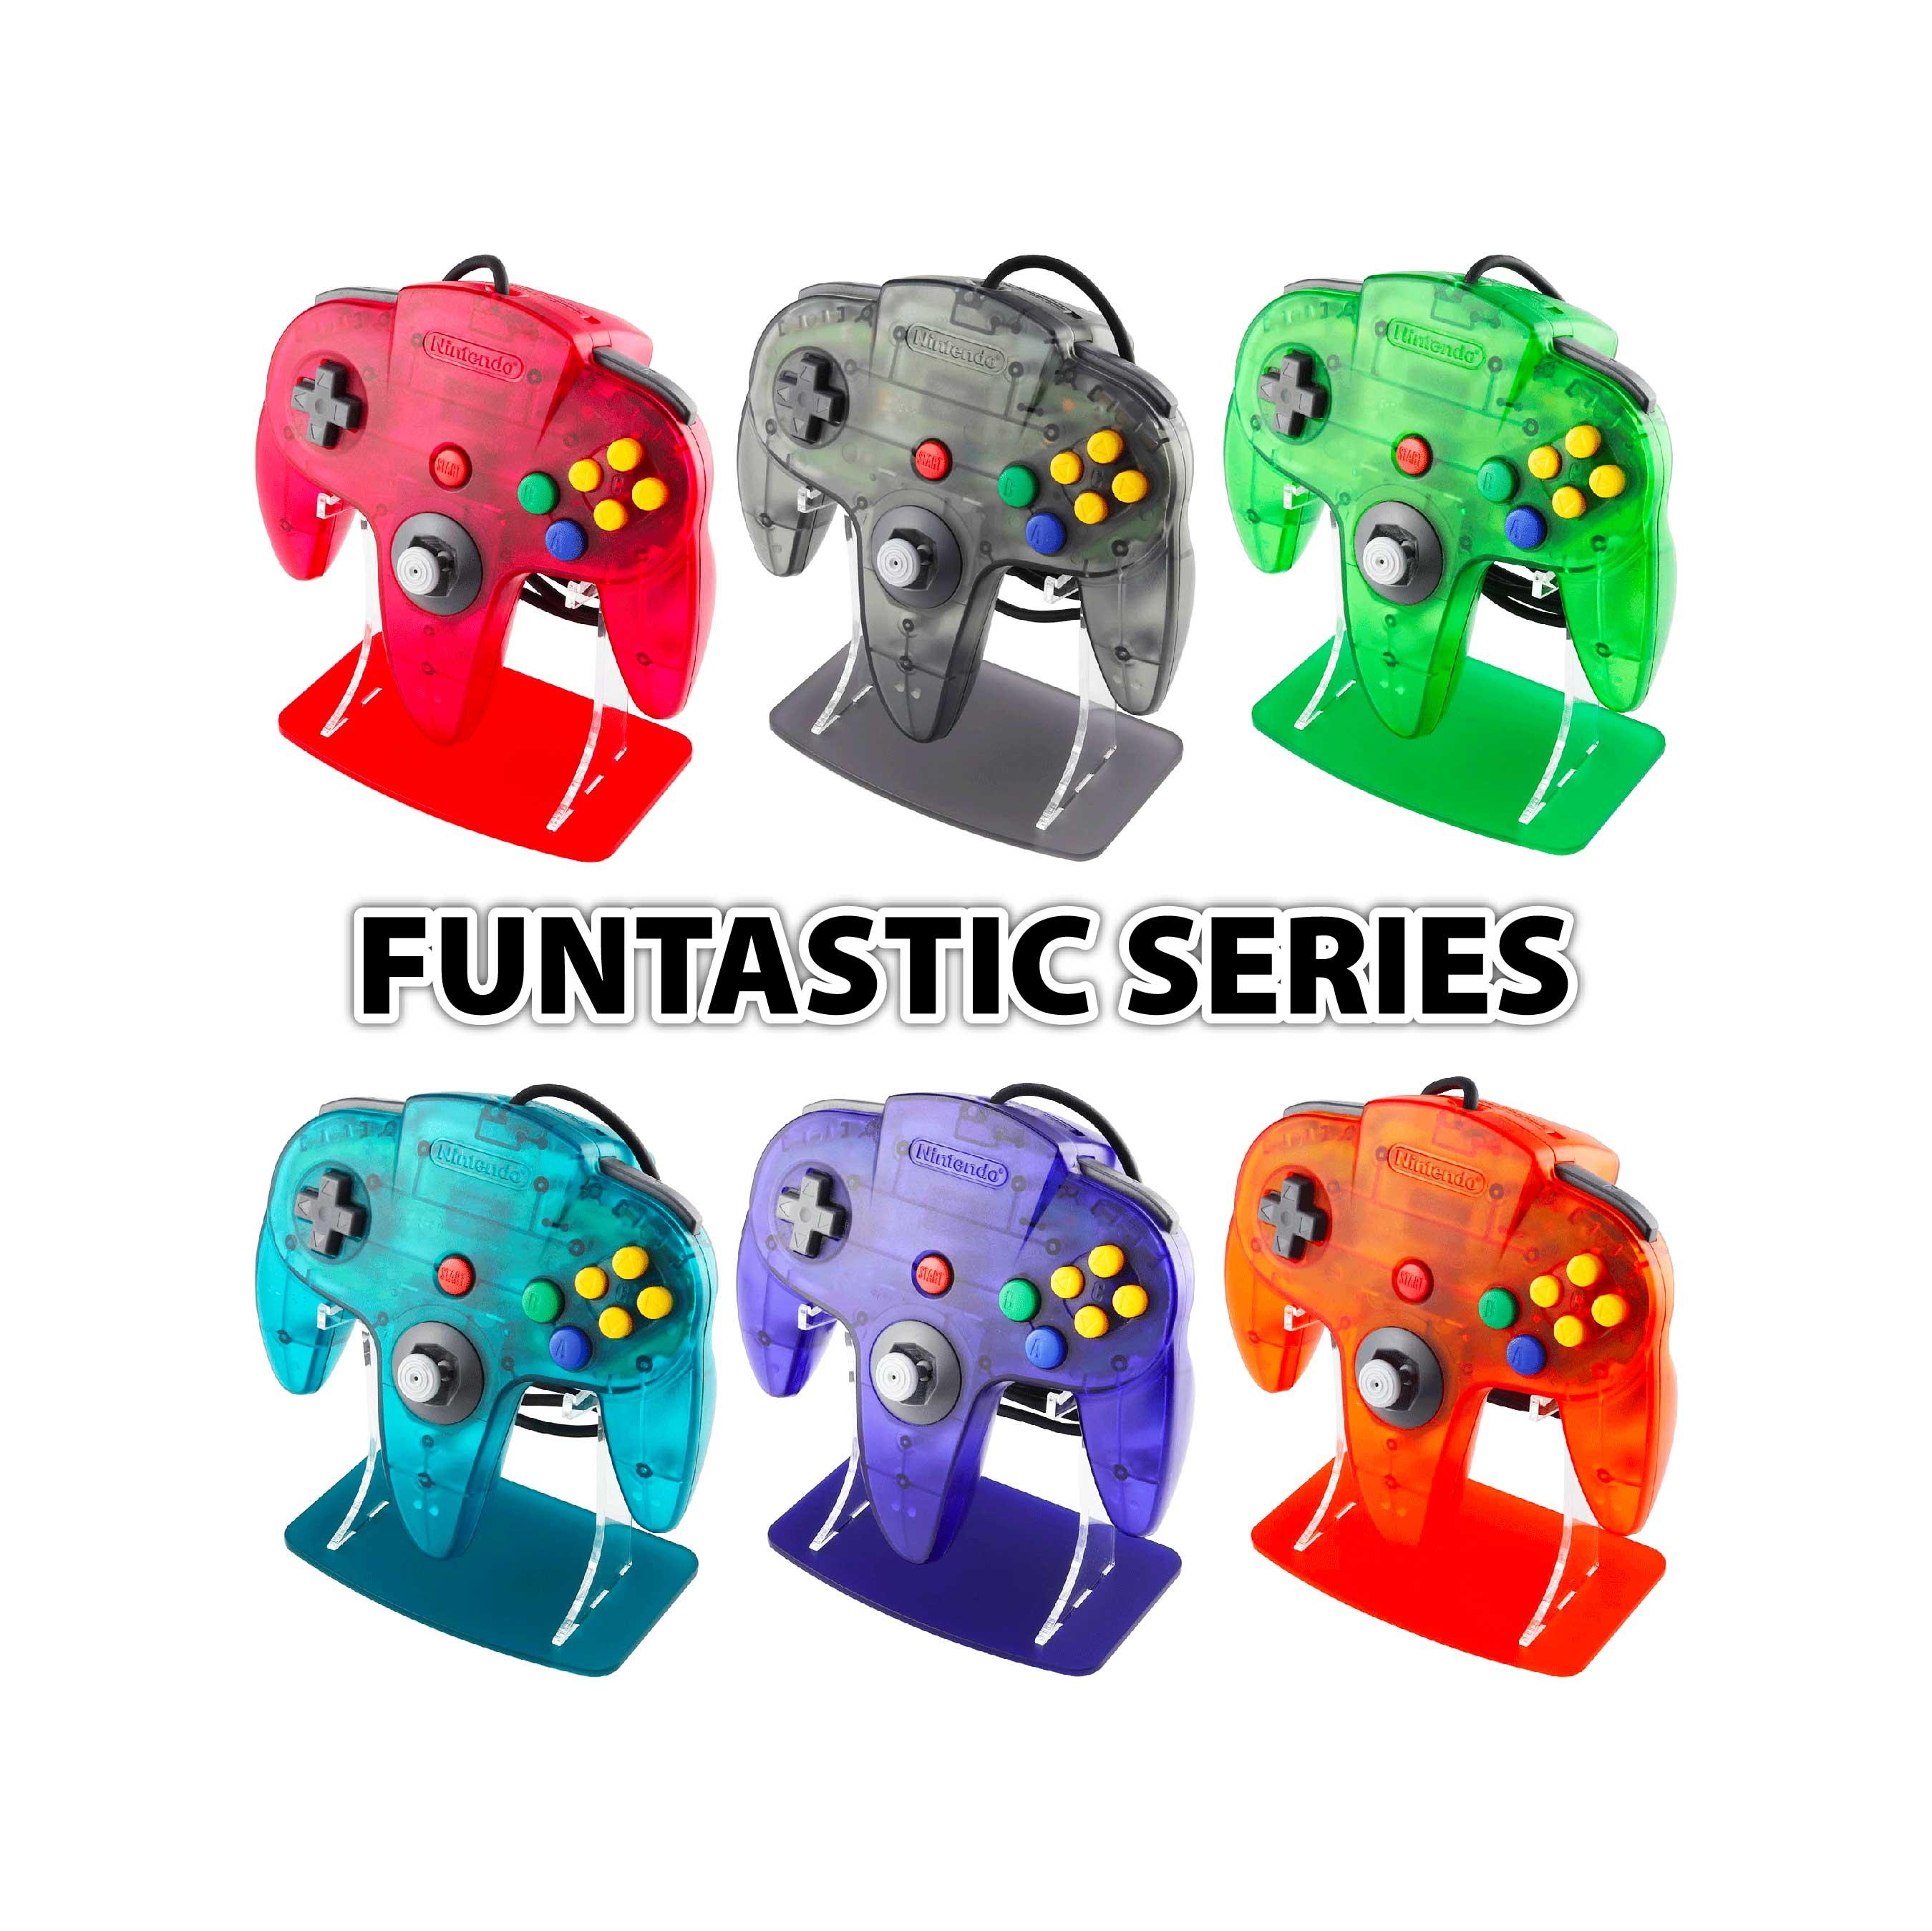 Nintendo 64 Funtastic Stands